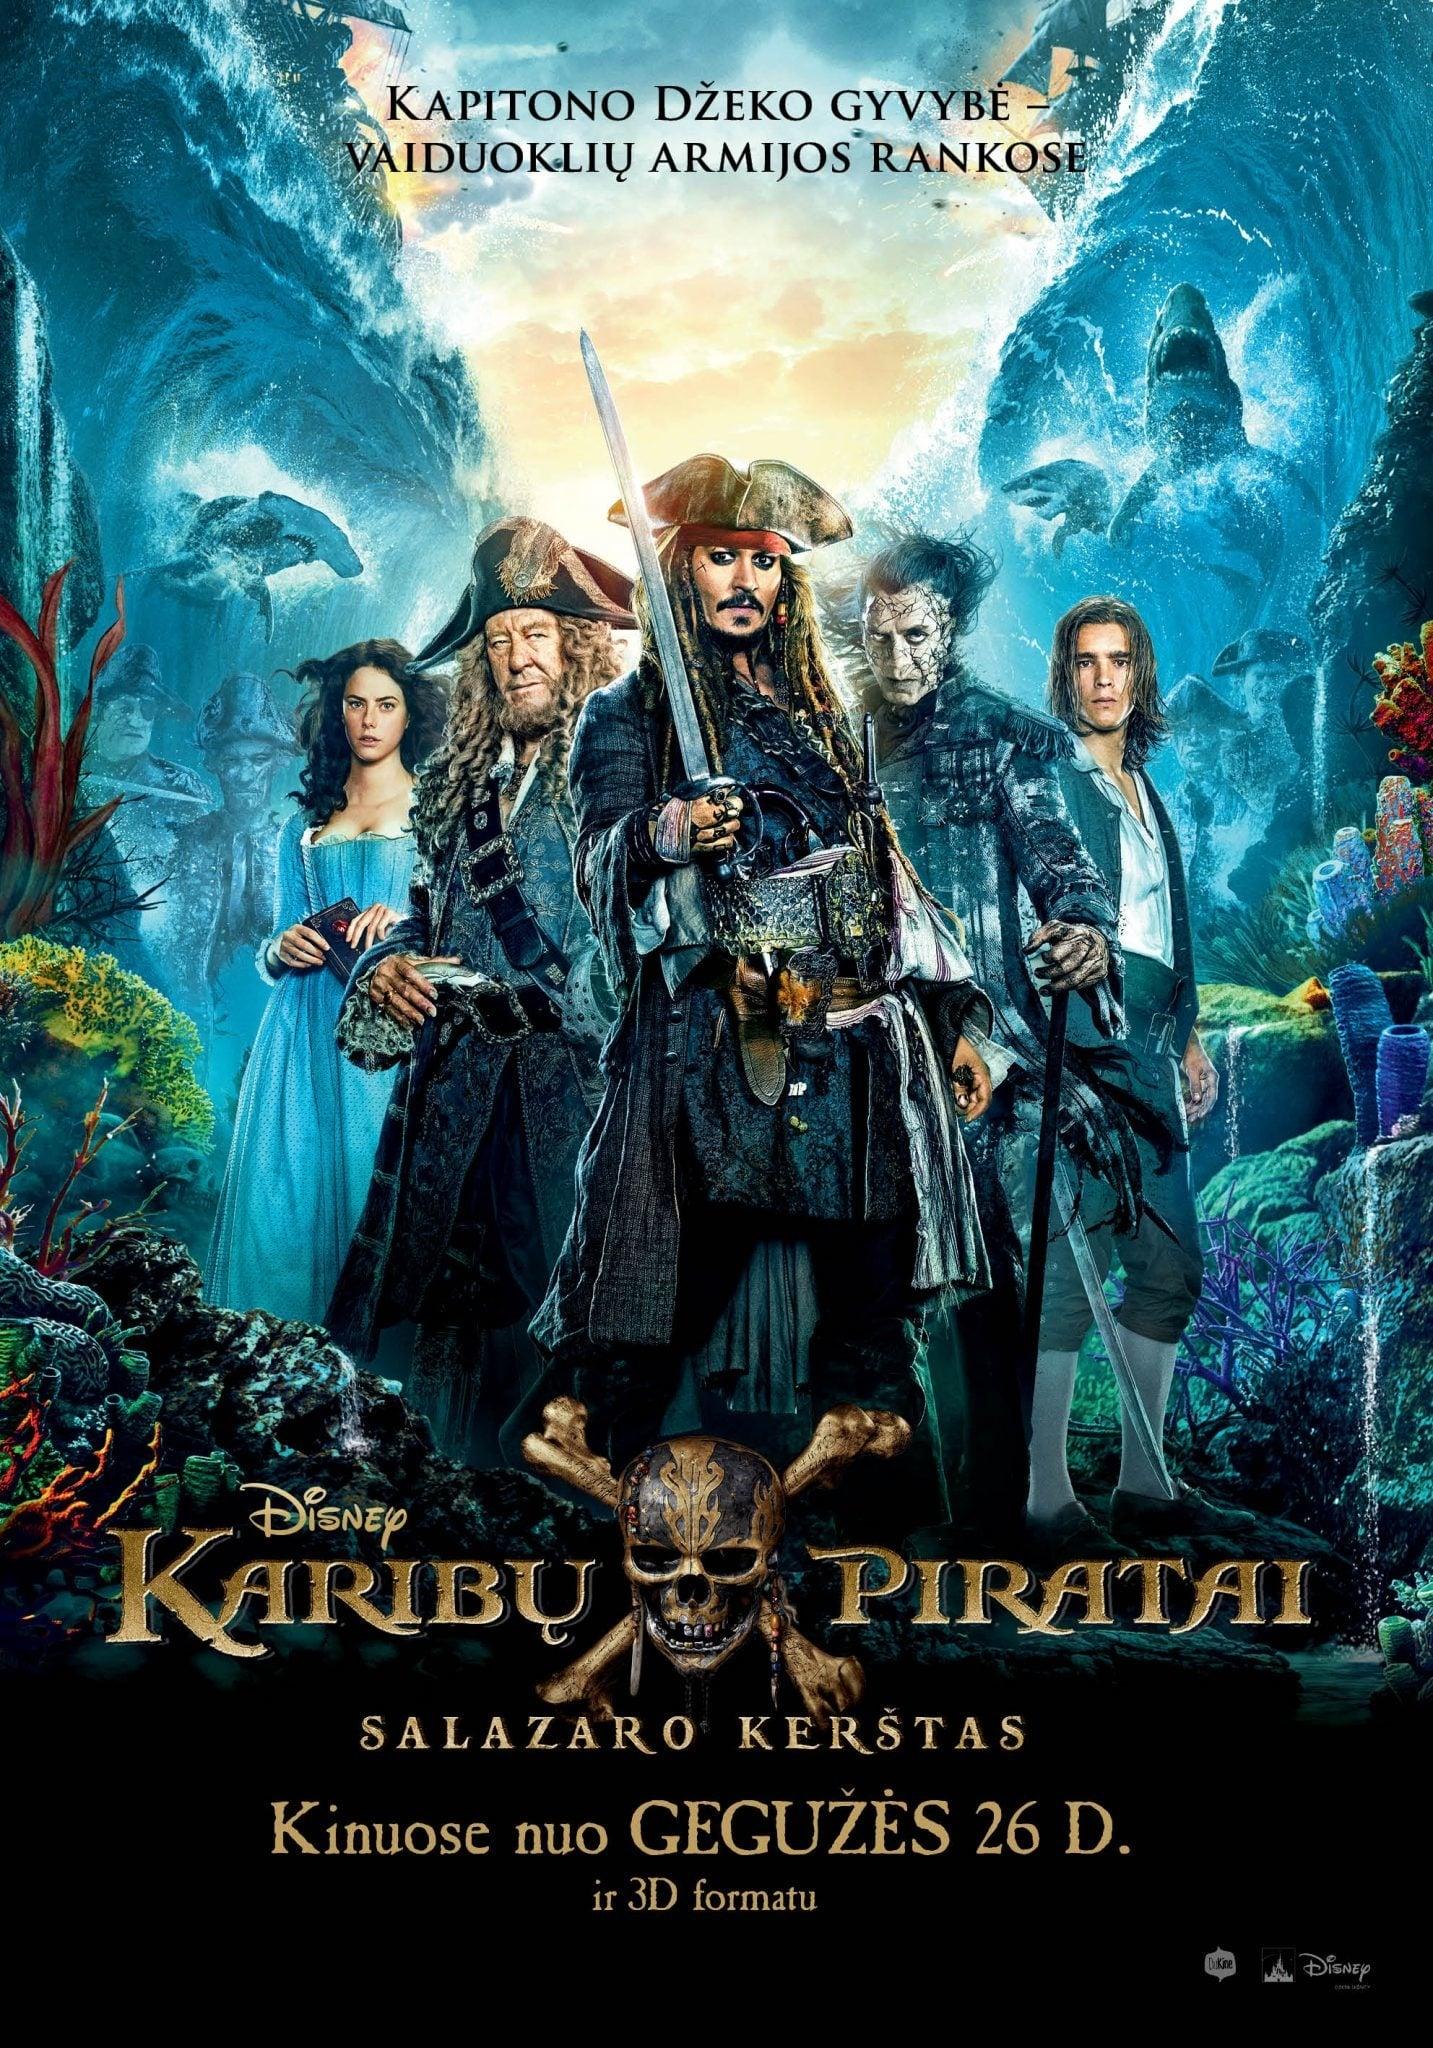 Karibų piratai. Salazaro kerštas / Pirates of the Caribbean: Dead Men Tell No Tales (2017)